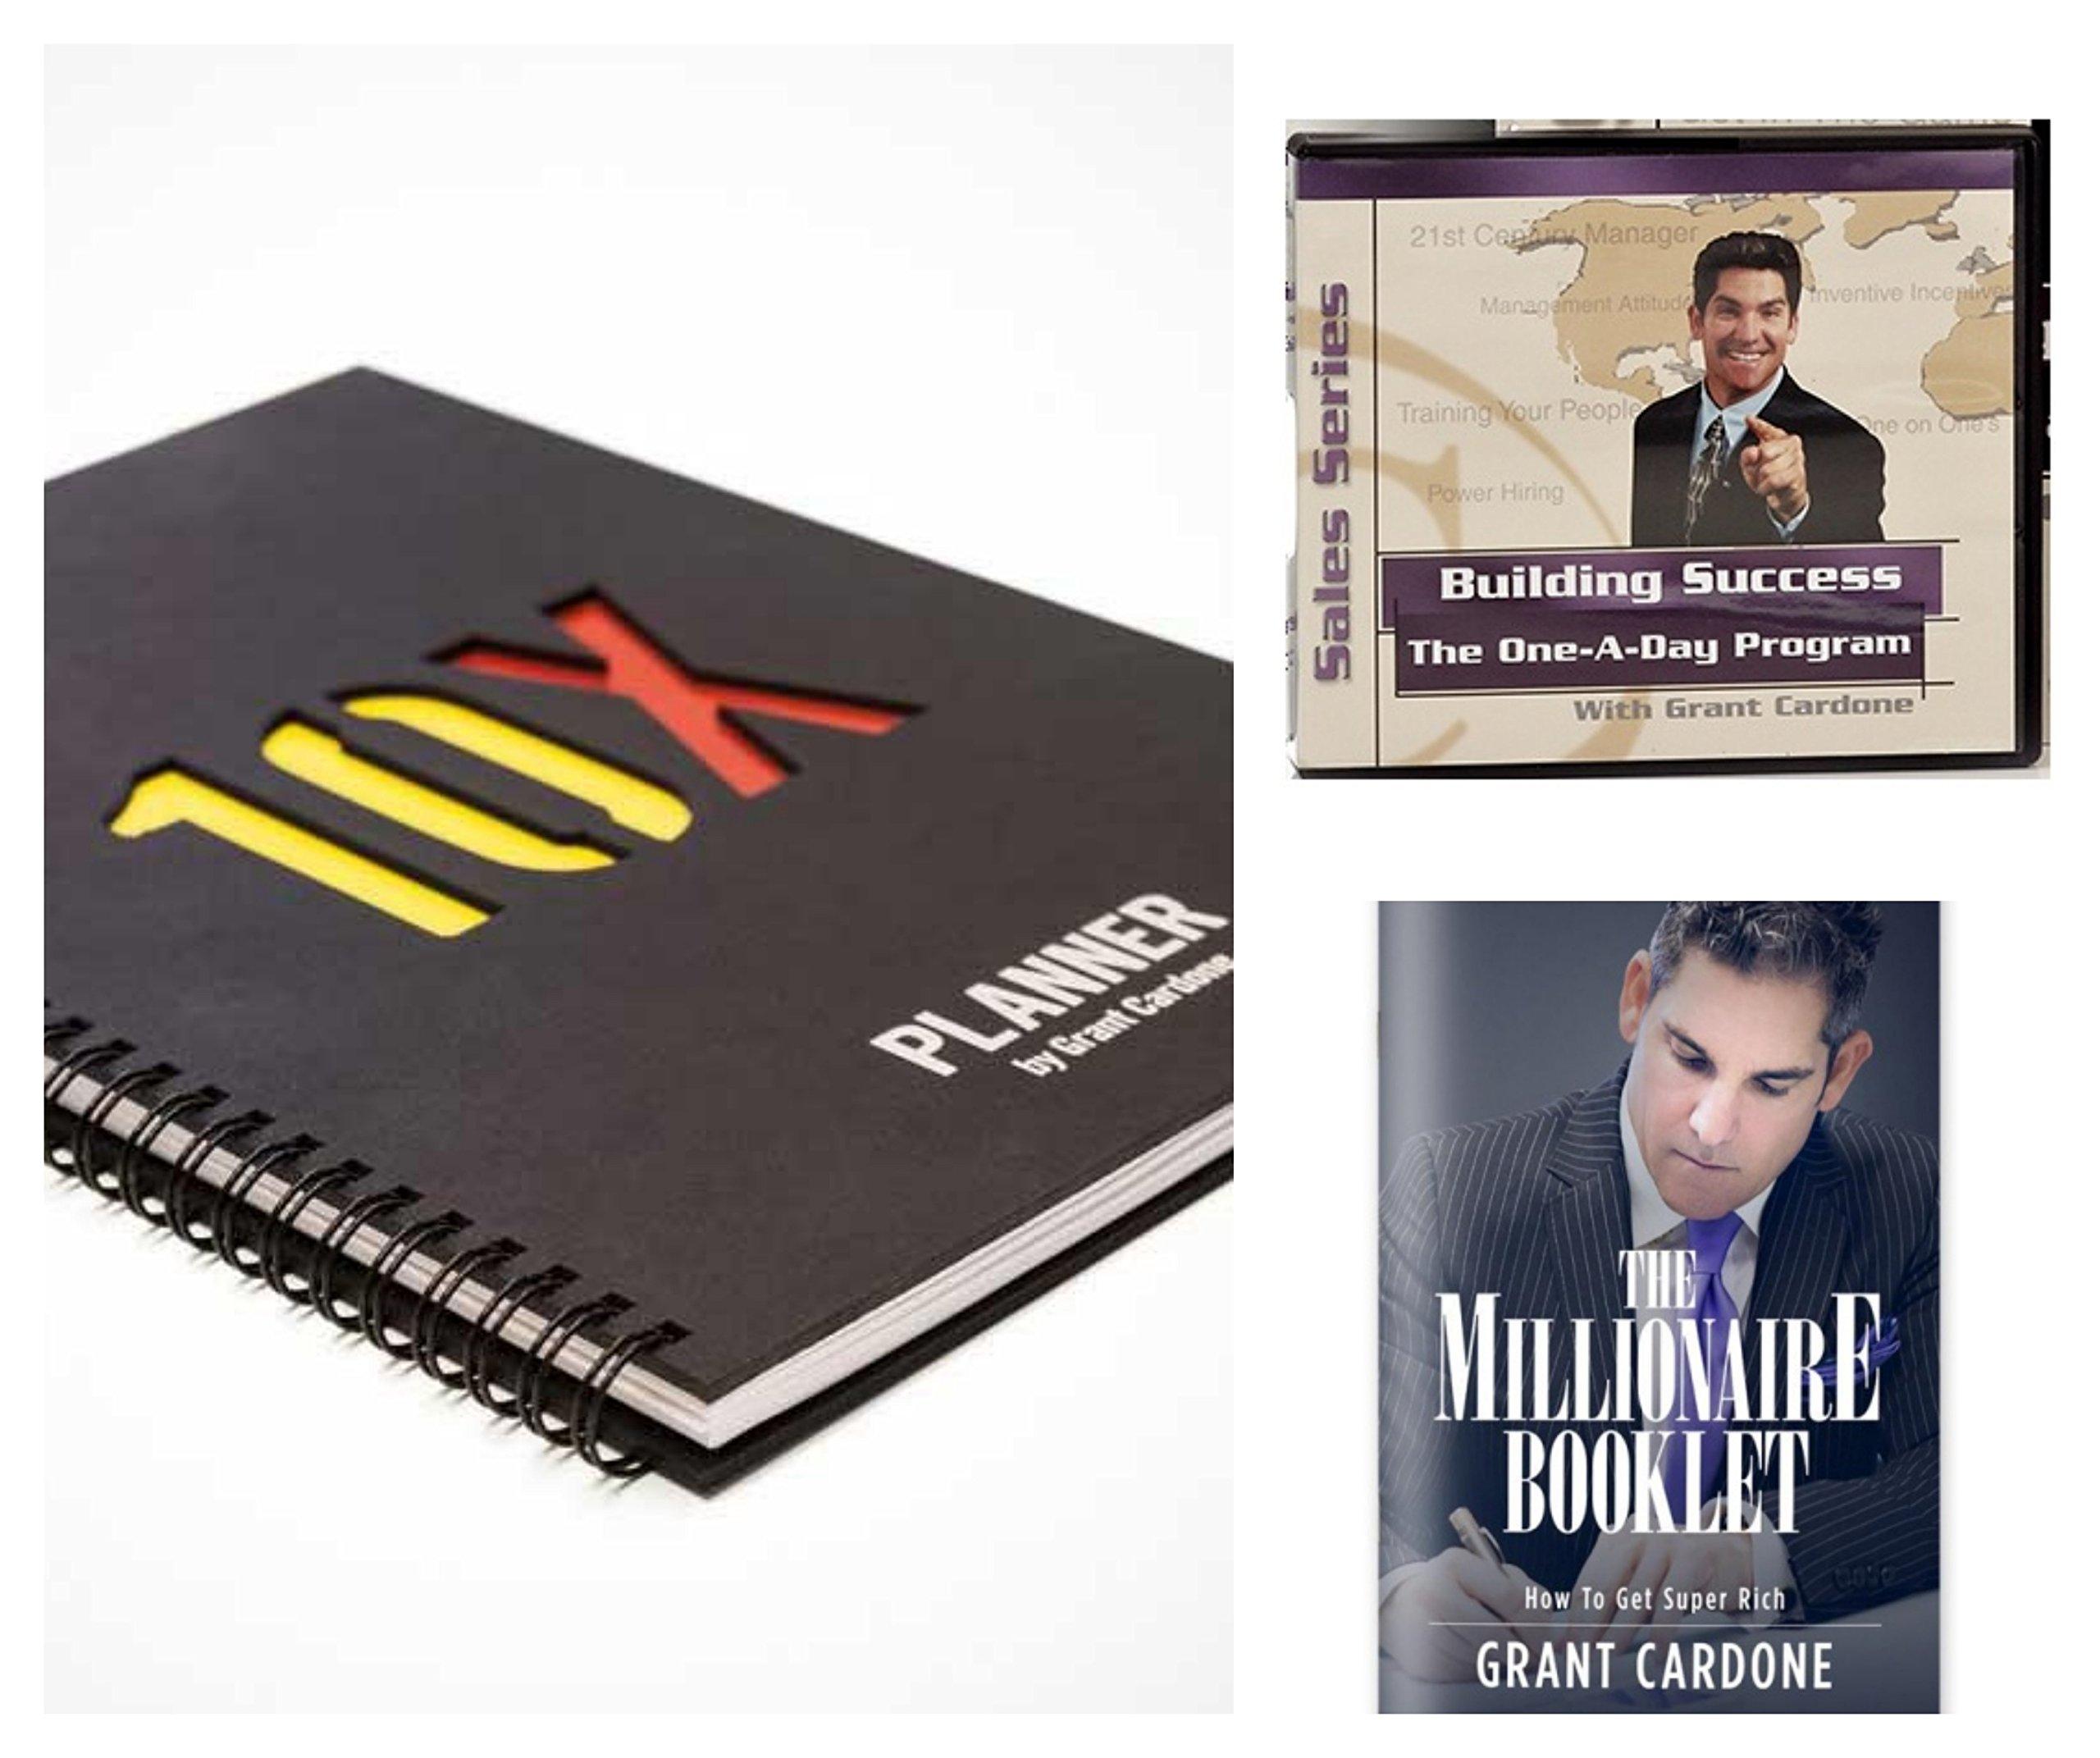 Grant Cardone 10X Planner Bundle with Building Success The Automotive One-A-Day Sales Series Audio Program & The Millionaire Booklet